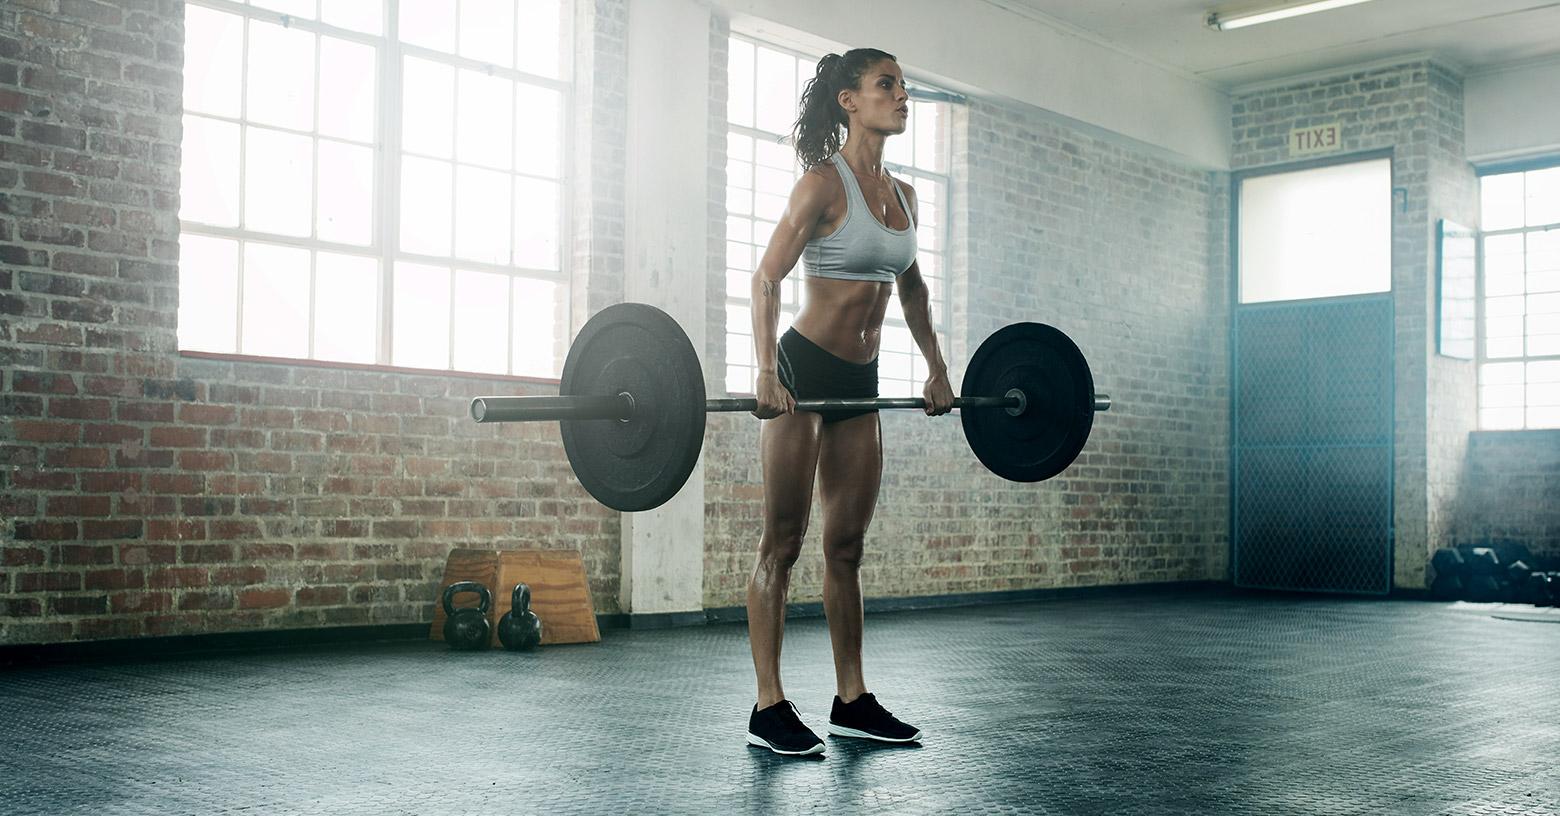 Skinny or Strong / Schlank oder muskulös